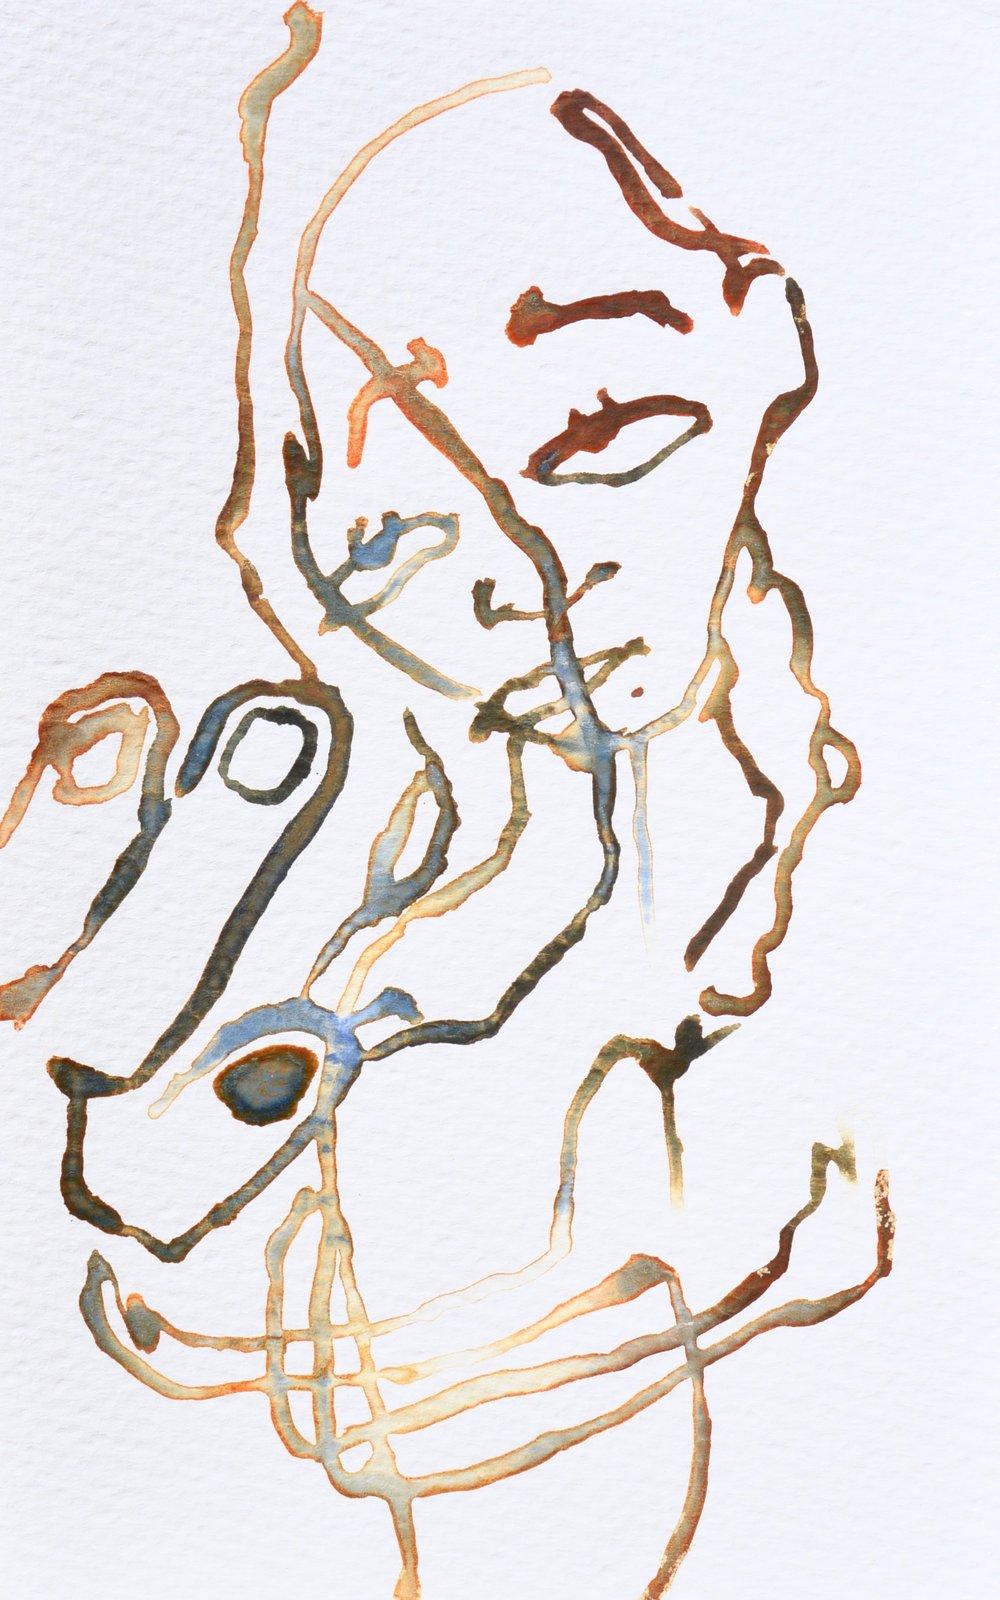 emlagh , 2016. Watercolor. 8 x 5 in.